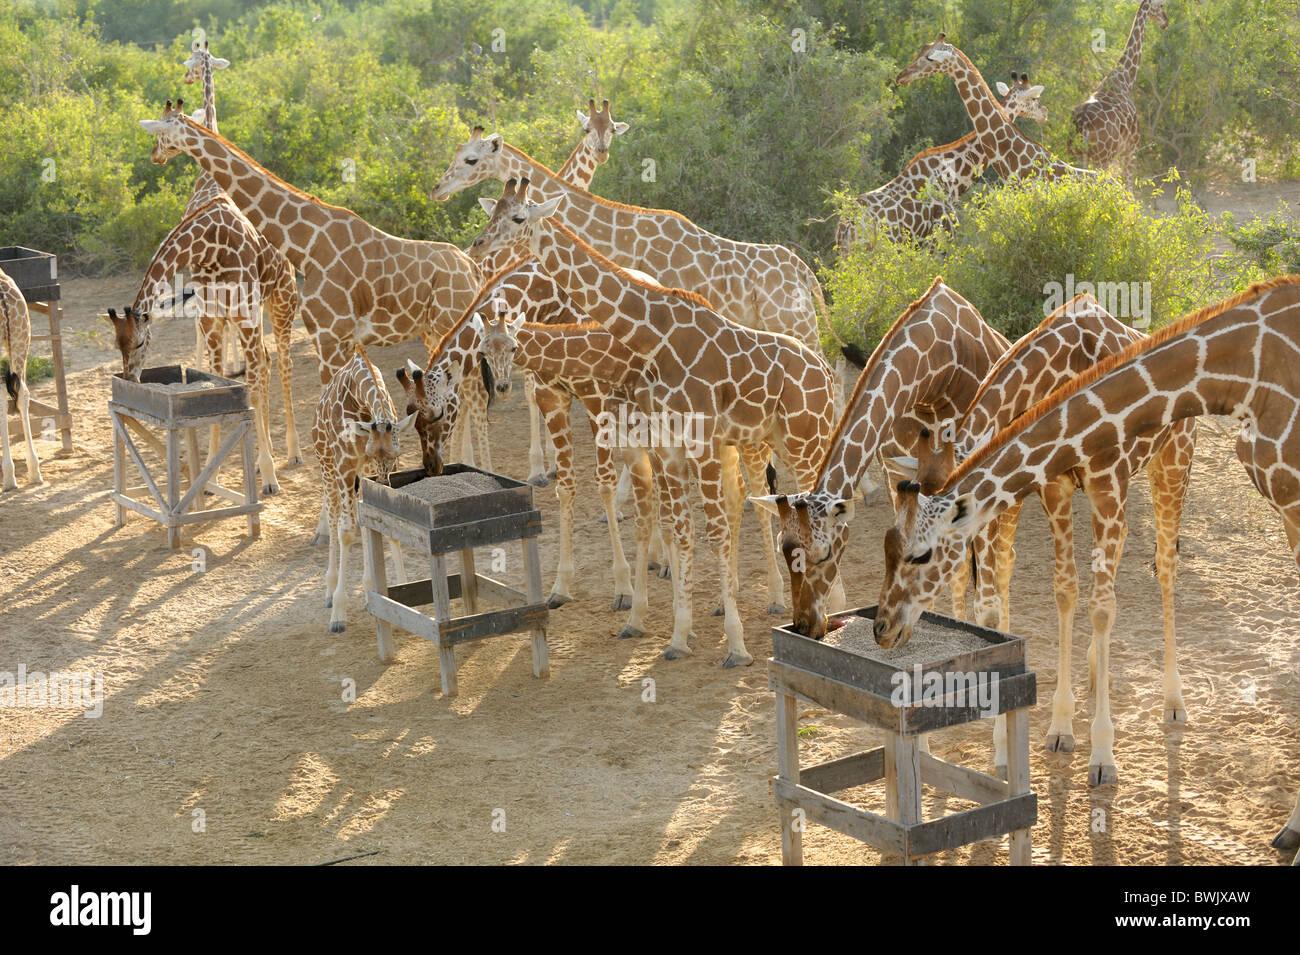 Adults & young giraffe (Giraffa camelopardalis) at feeding station on Sir Bani Yas Island, UAE - Stock Image